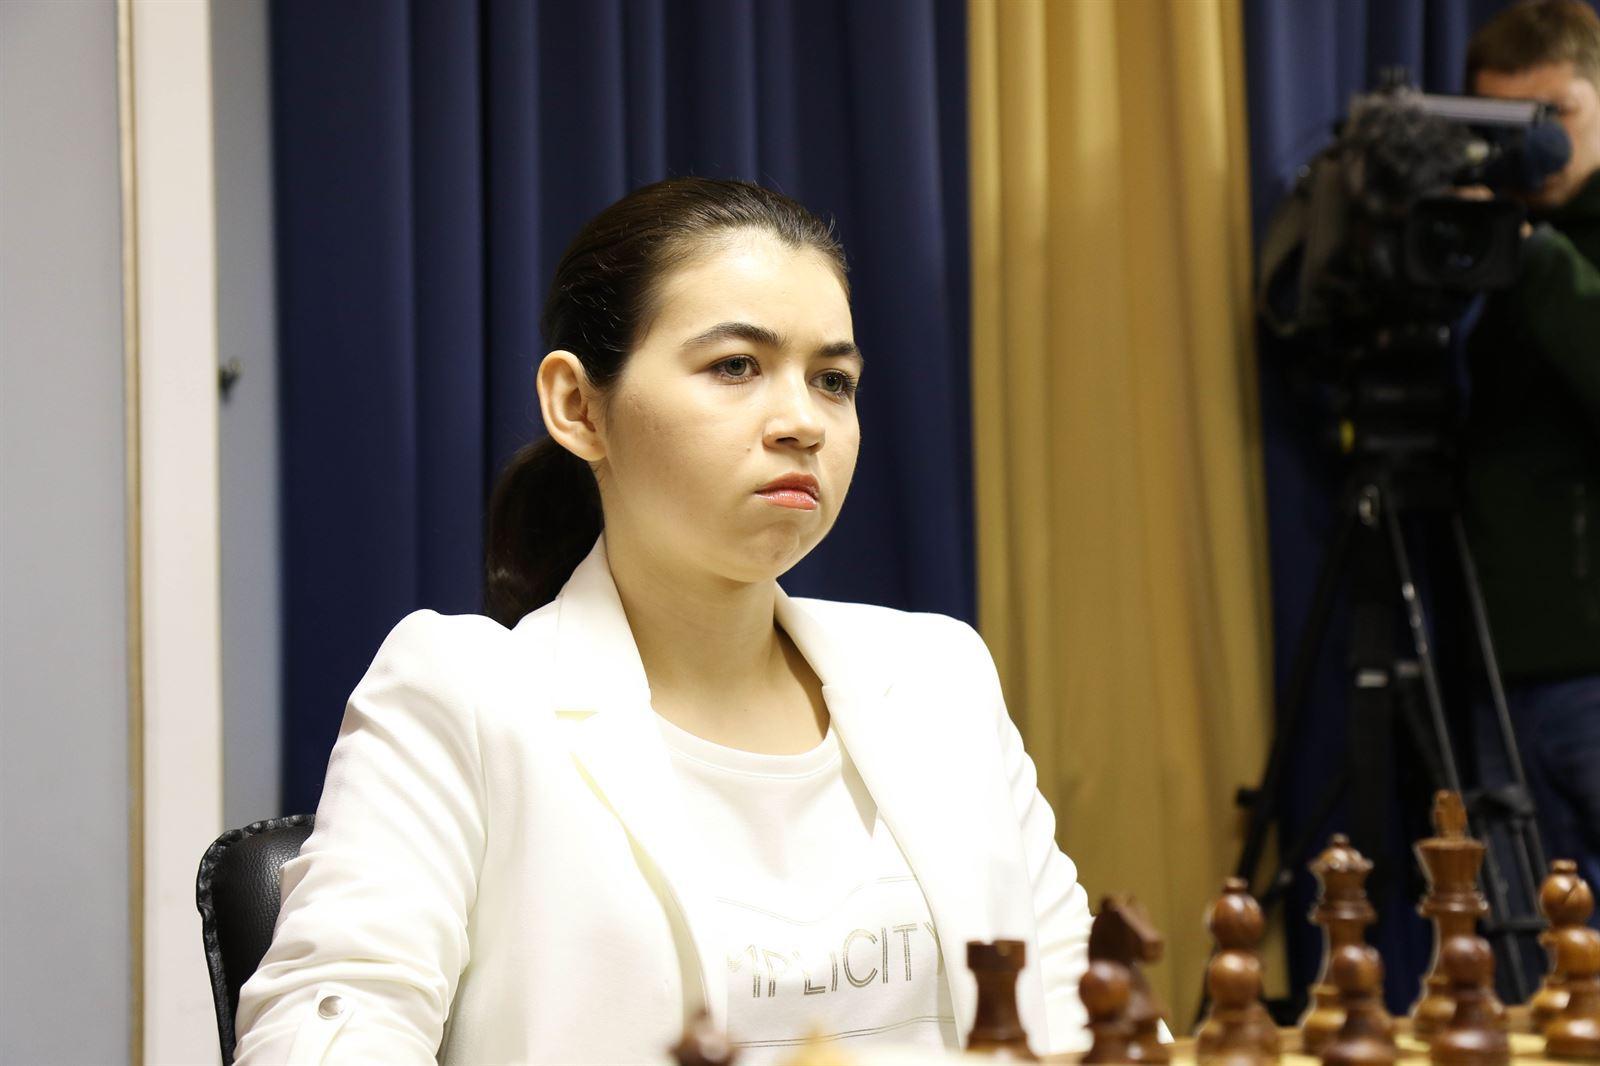 GORYACHKINA ALEXANDRA WINS FIDE WOMEN'S CANDIDATES TOURNAMENT